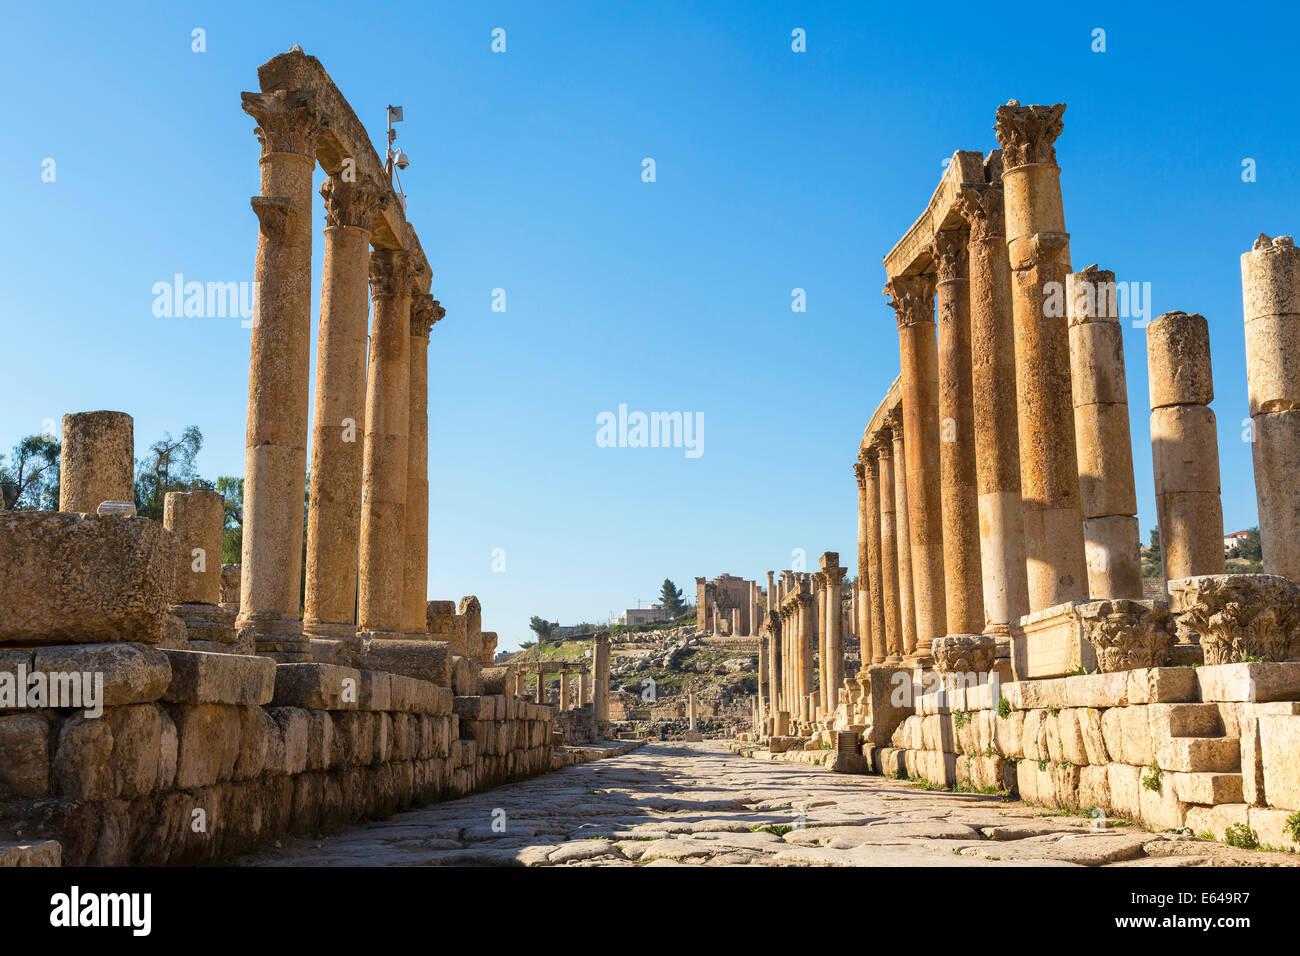 Cardo Maximus, la rue à colonnade, ruines romaines, Jerash, Jordanie Photo Stock